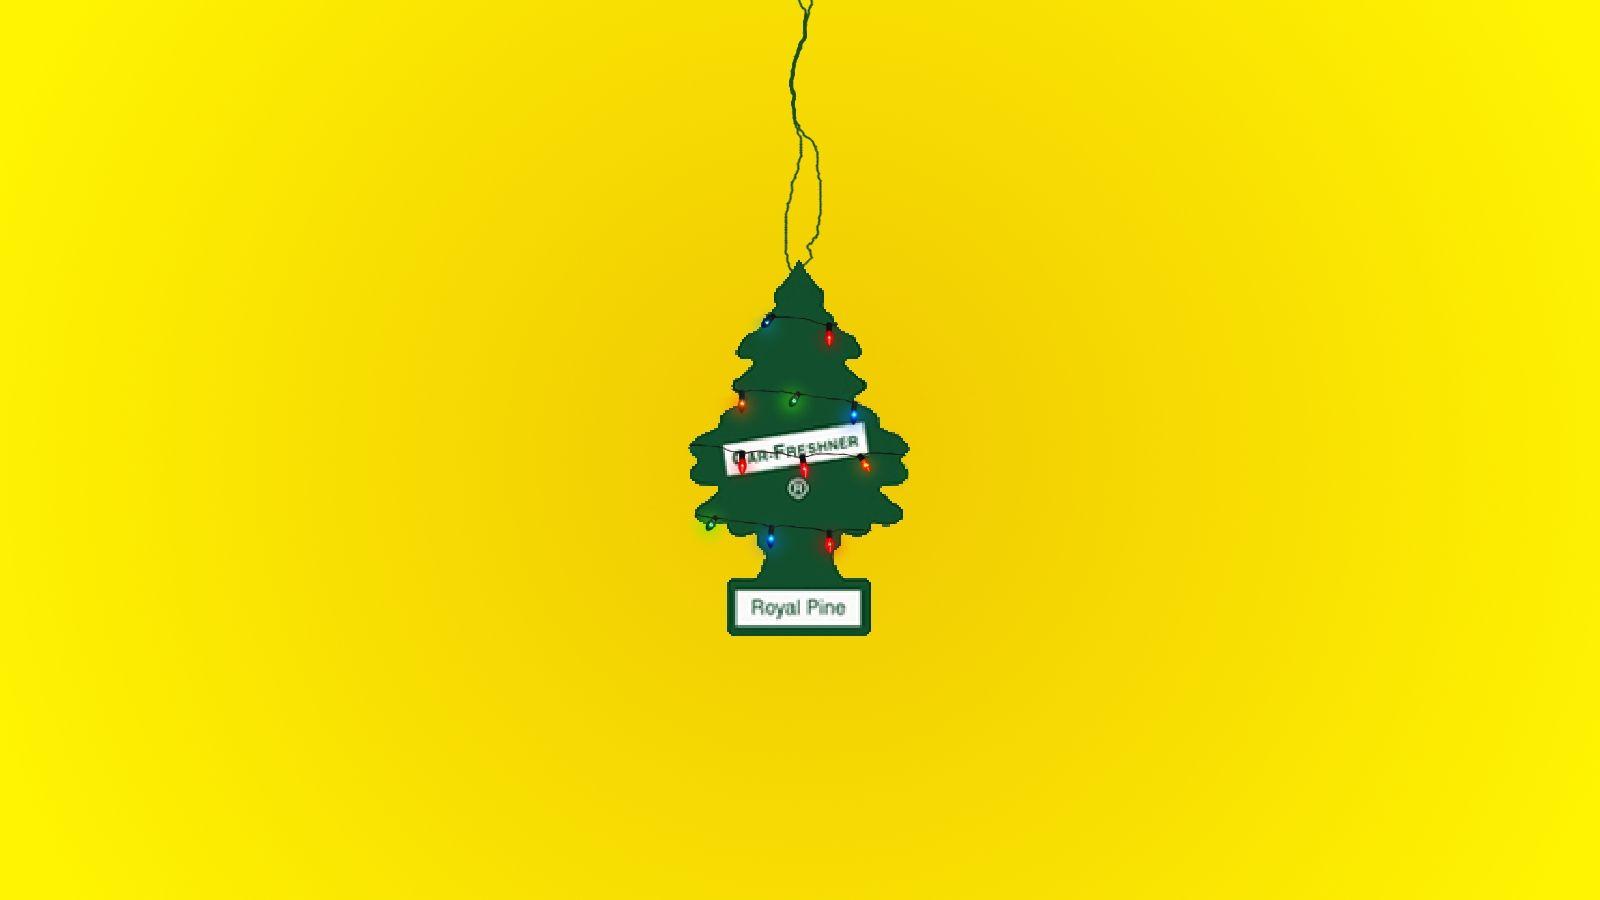 Christmas Tree Air Freshener Air Freshener Christmas Tree Wallpaper